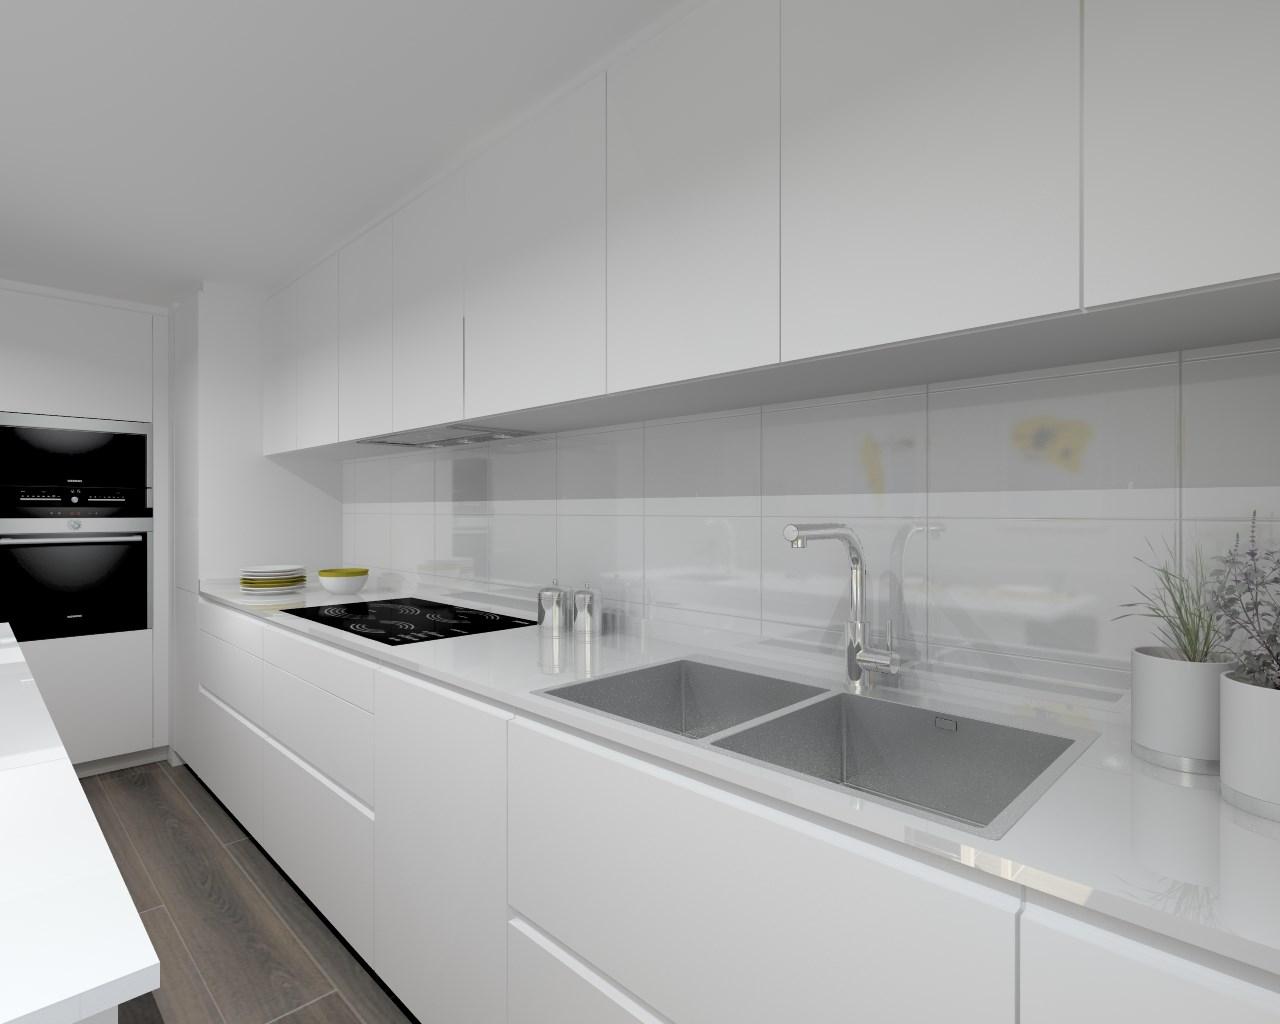 Aravaca cocina santos modelo laminado blanco - Cocinas blancas pequenas ...